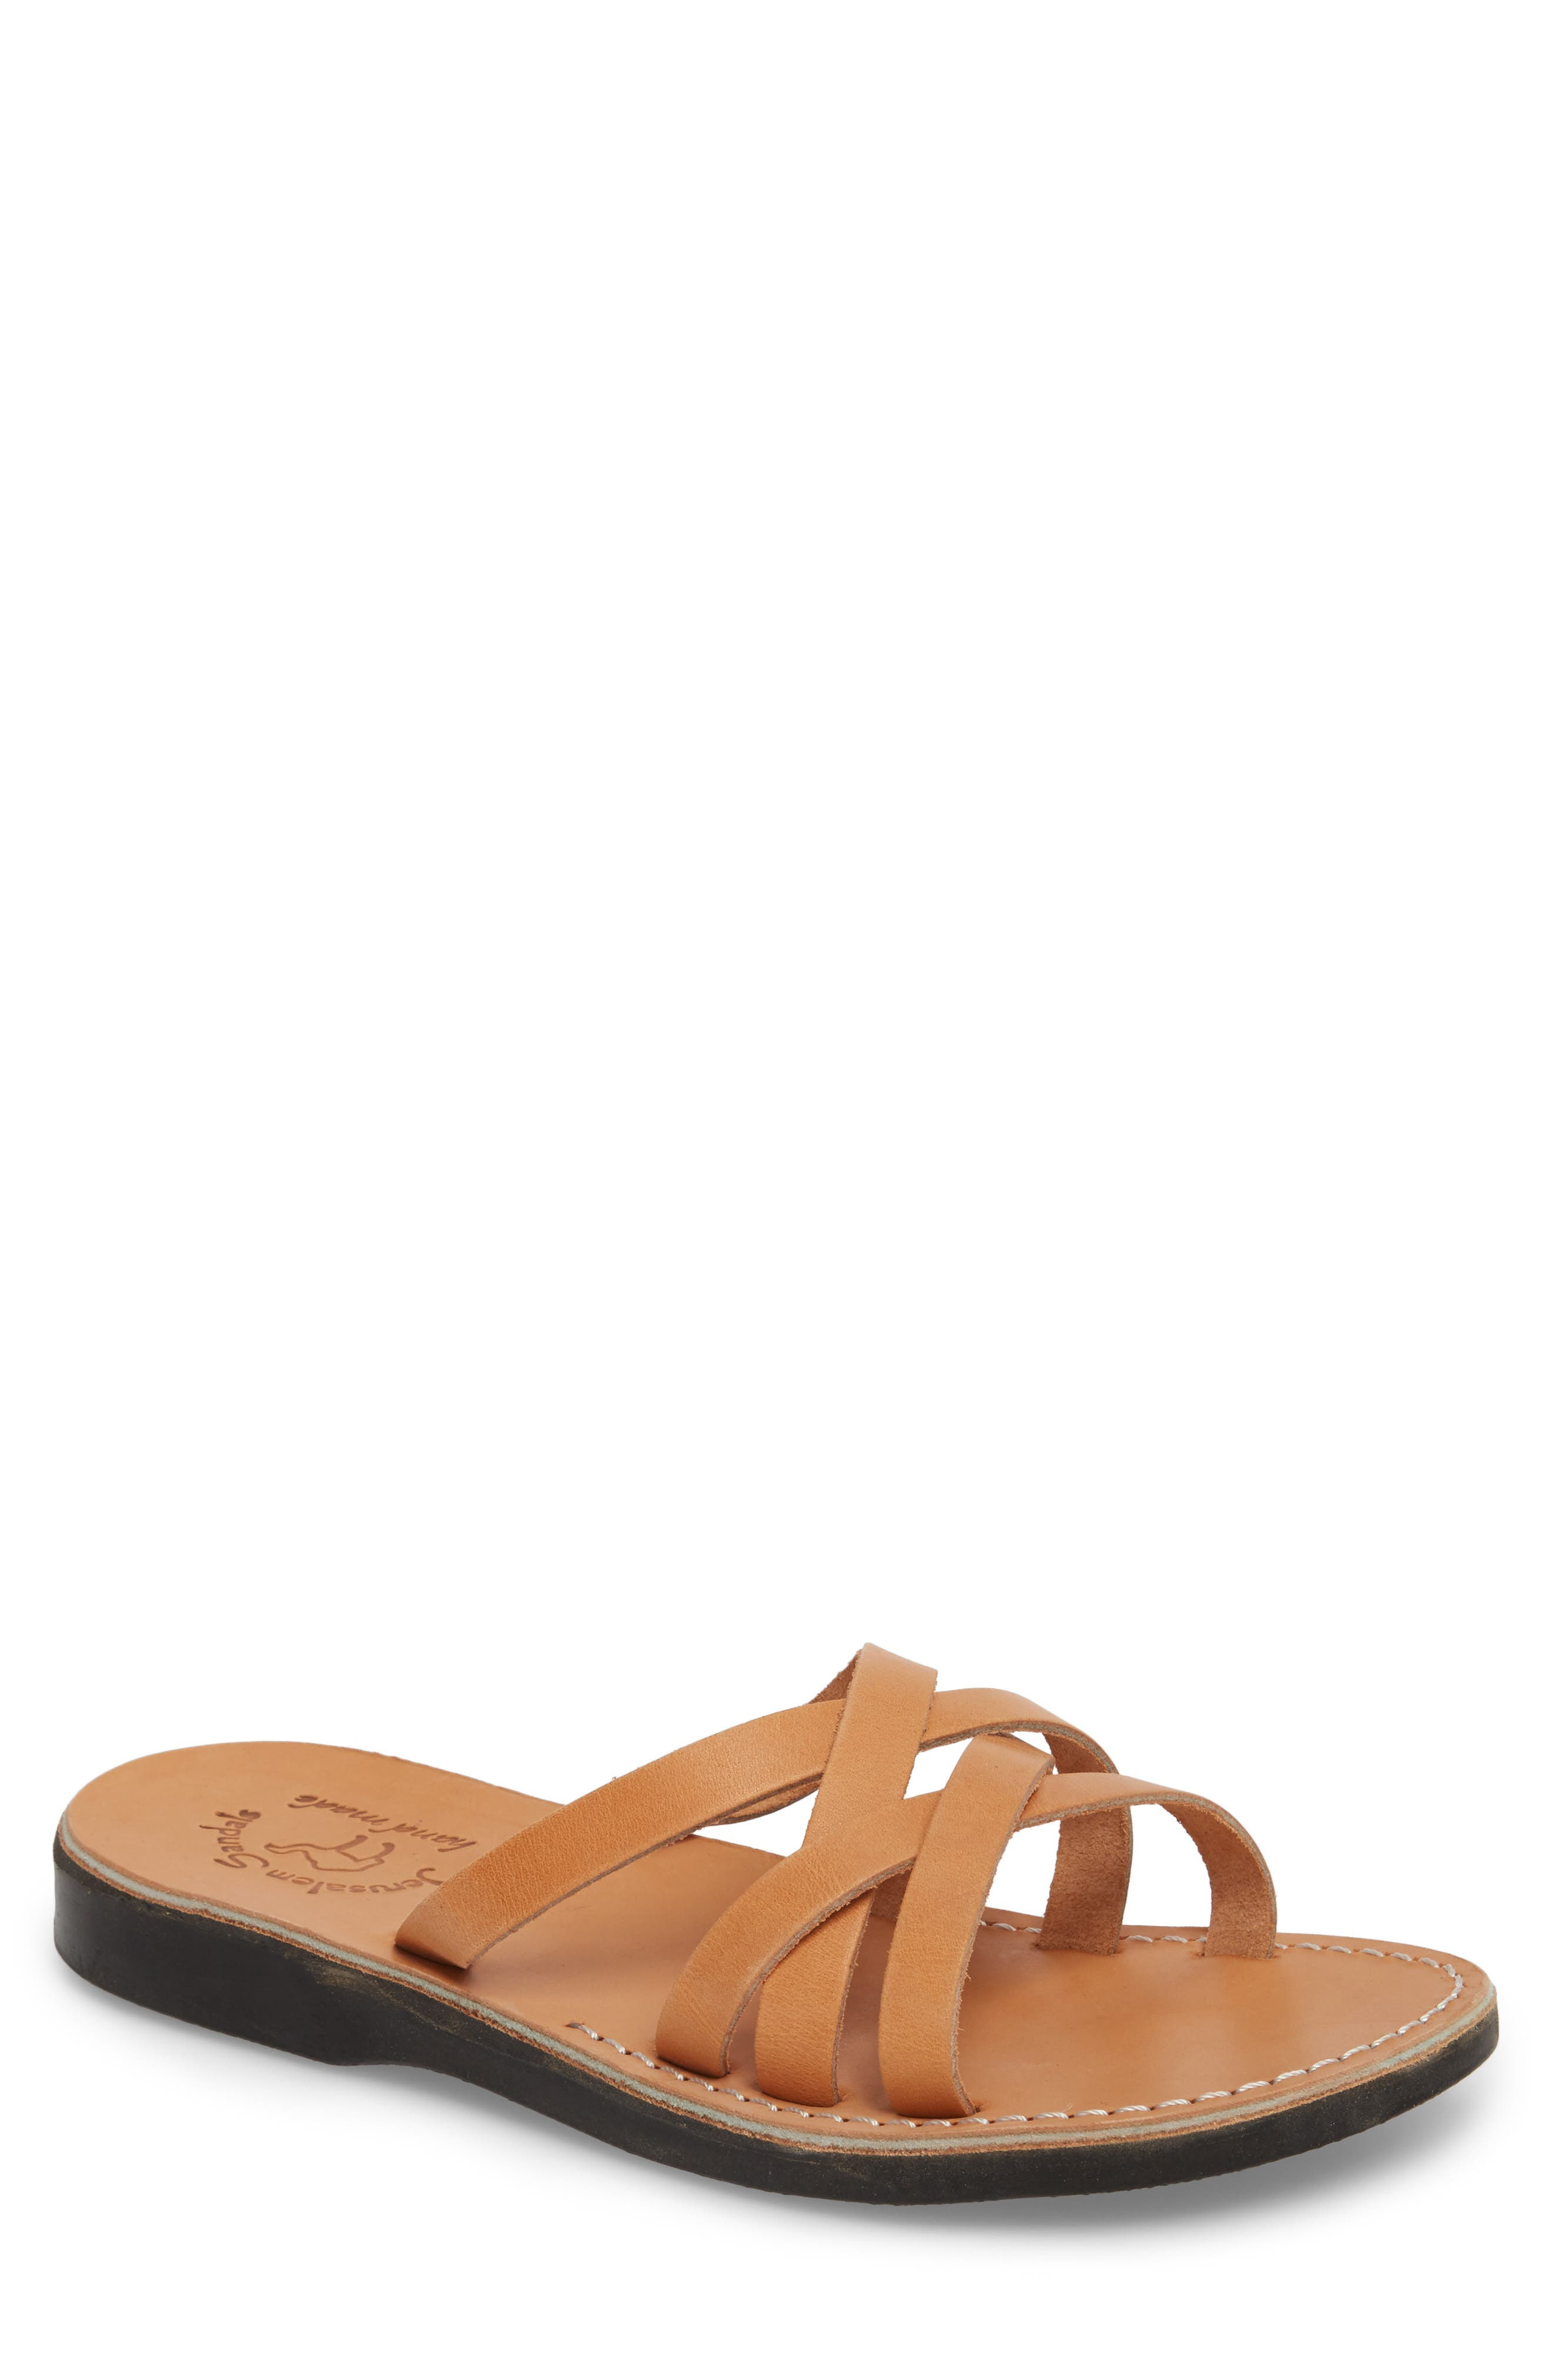 Gad Cross Strap Slide Sandal,                             Main thumbnail 1, color,                             Tan Leather